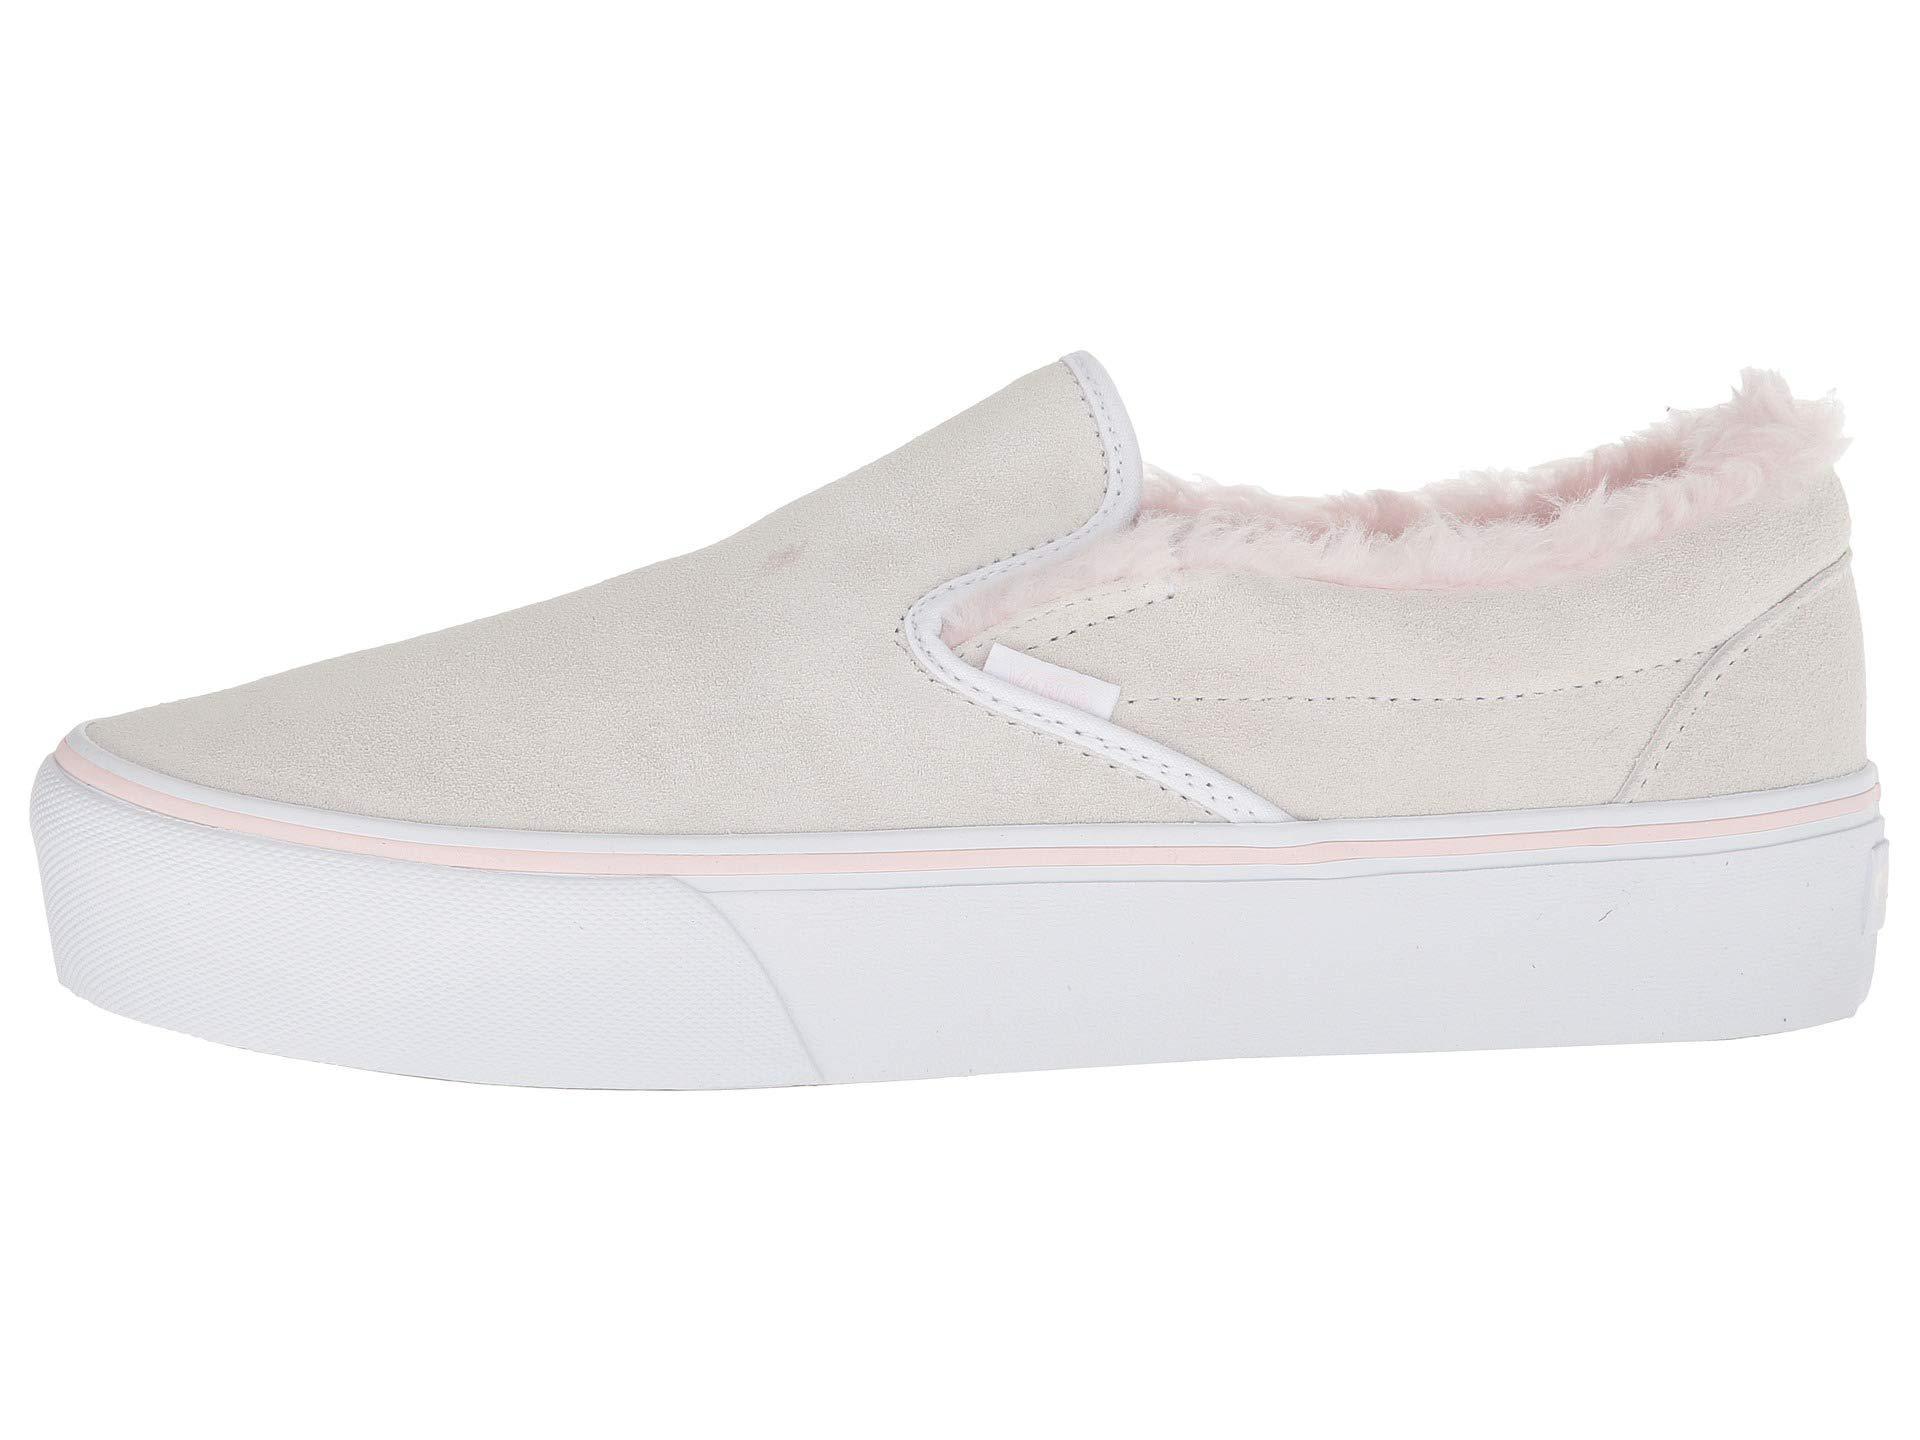 Vans Canvas Women Classic Slip-on